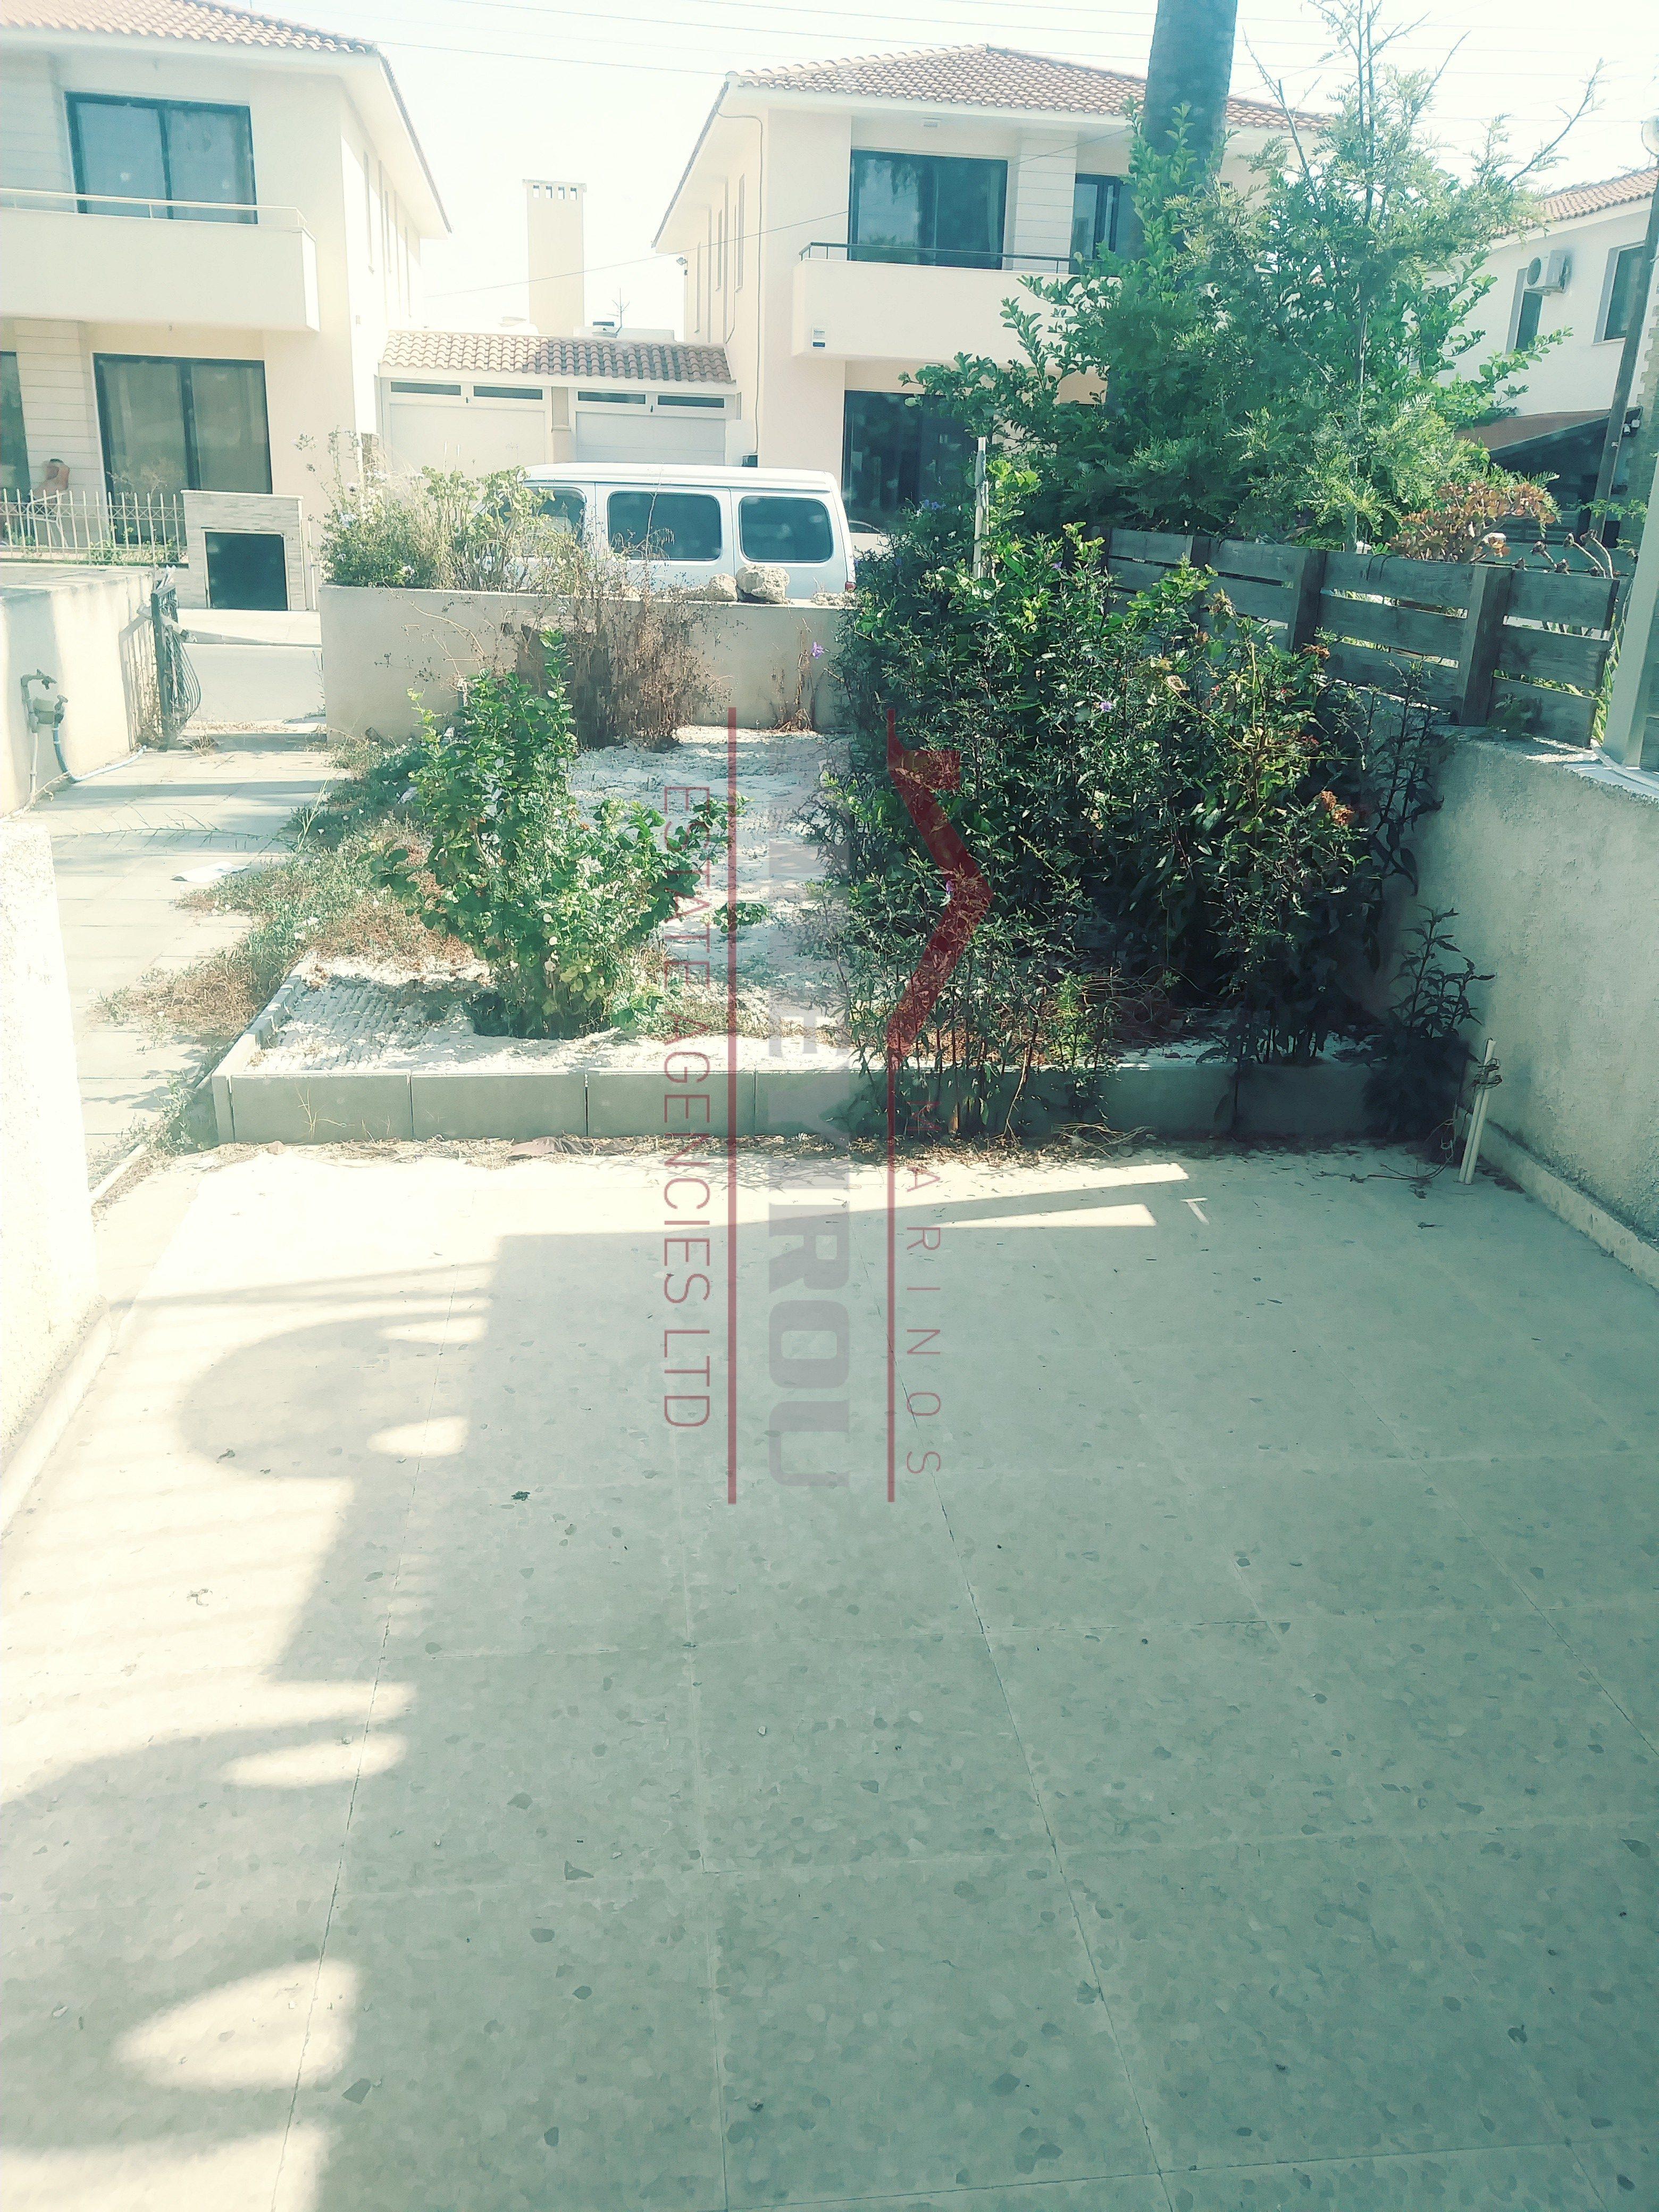 2 bedroom house Dekelia Road, Larnaca